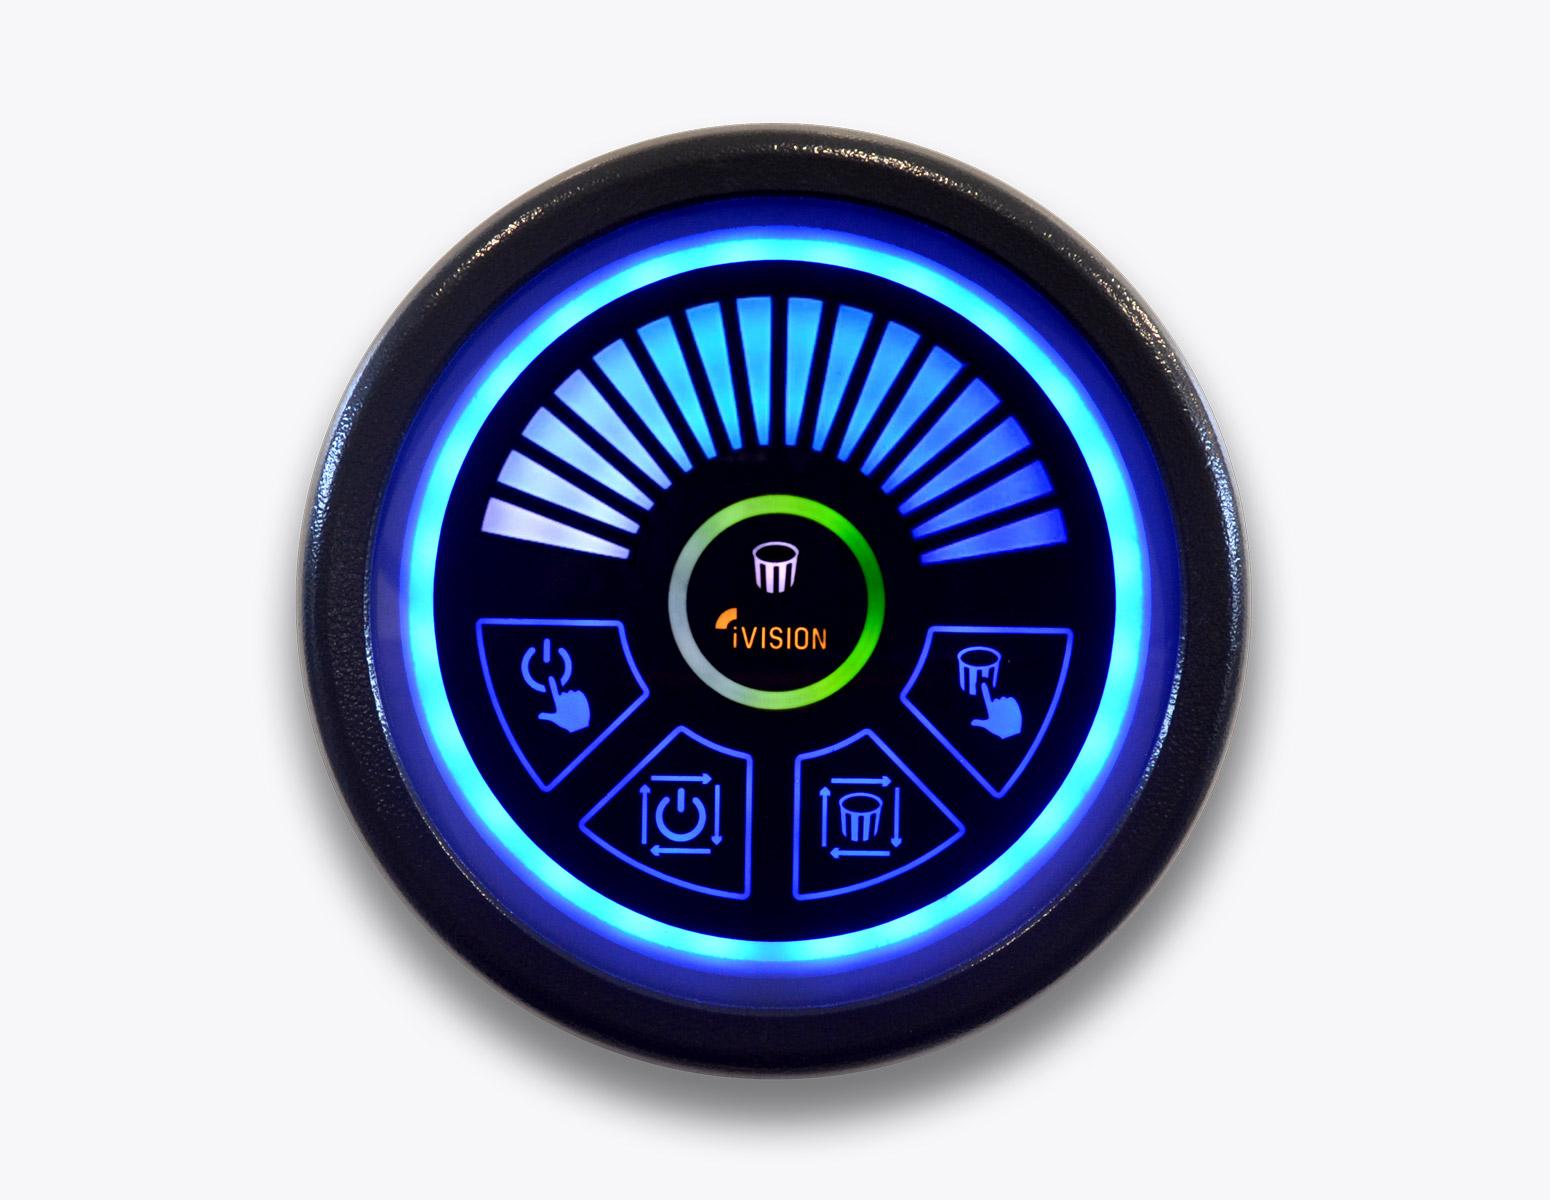 touch-industrial-vacuum-cleaners-ivision-vacuum